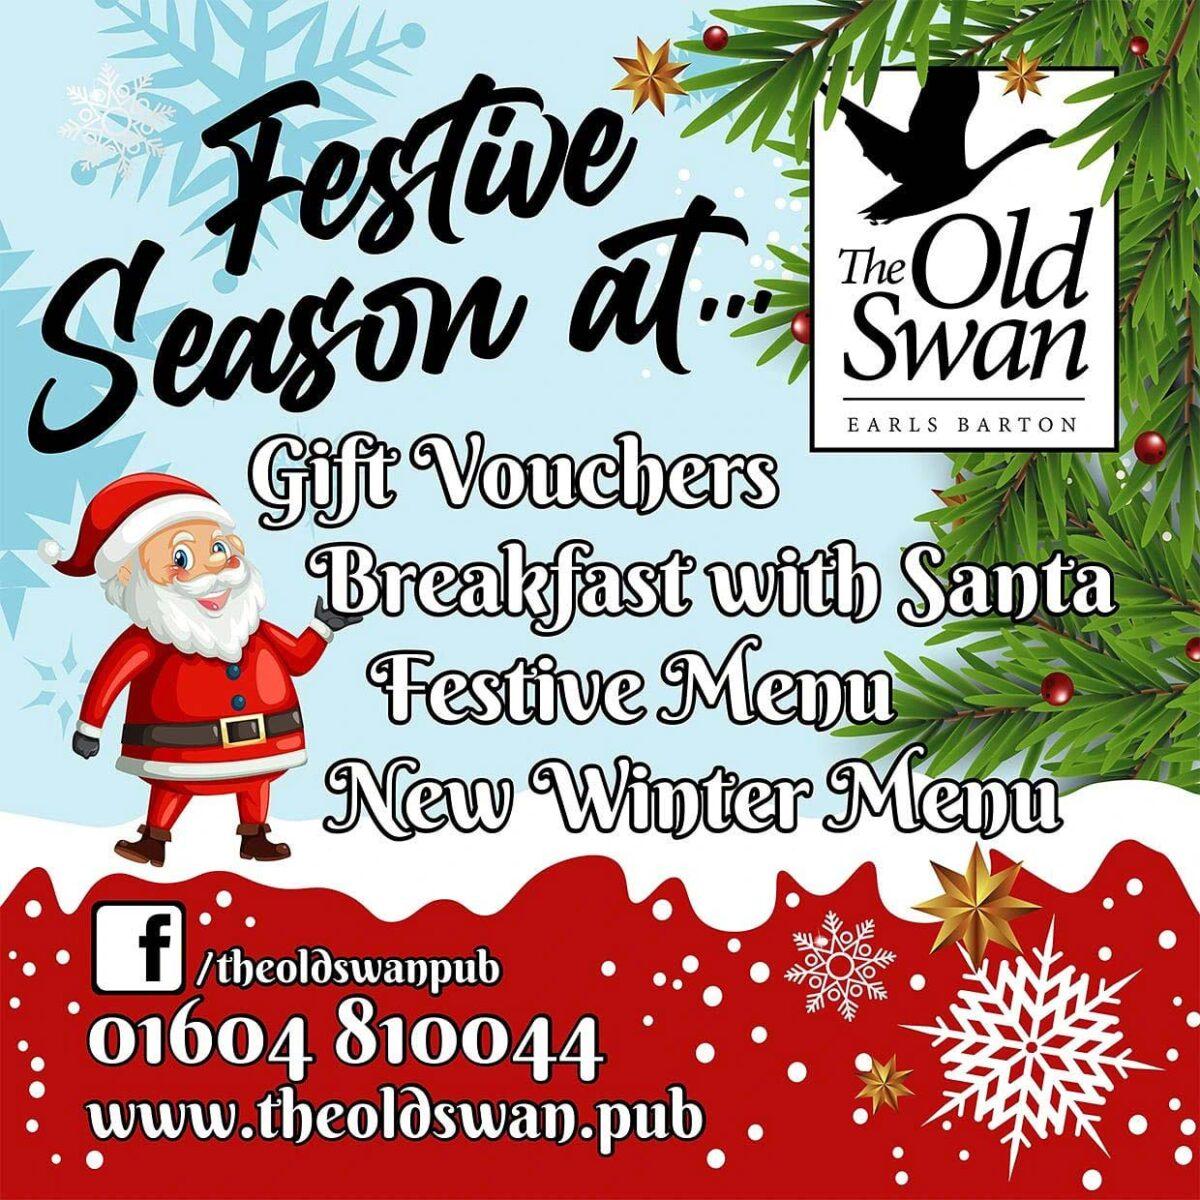 Festive Season Gift Vouchers